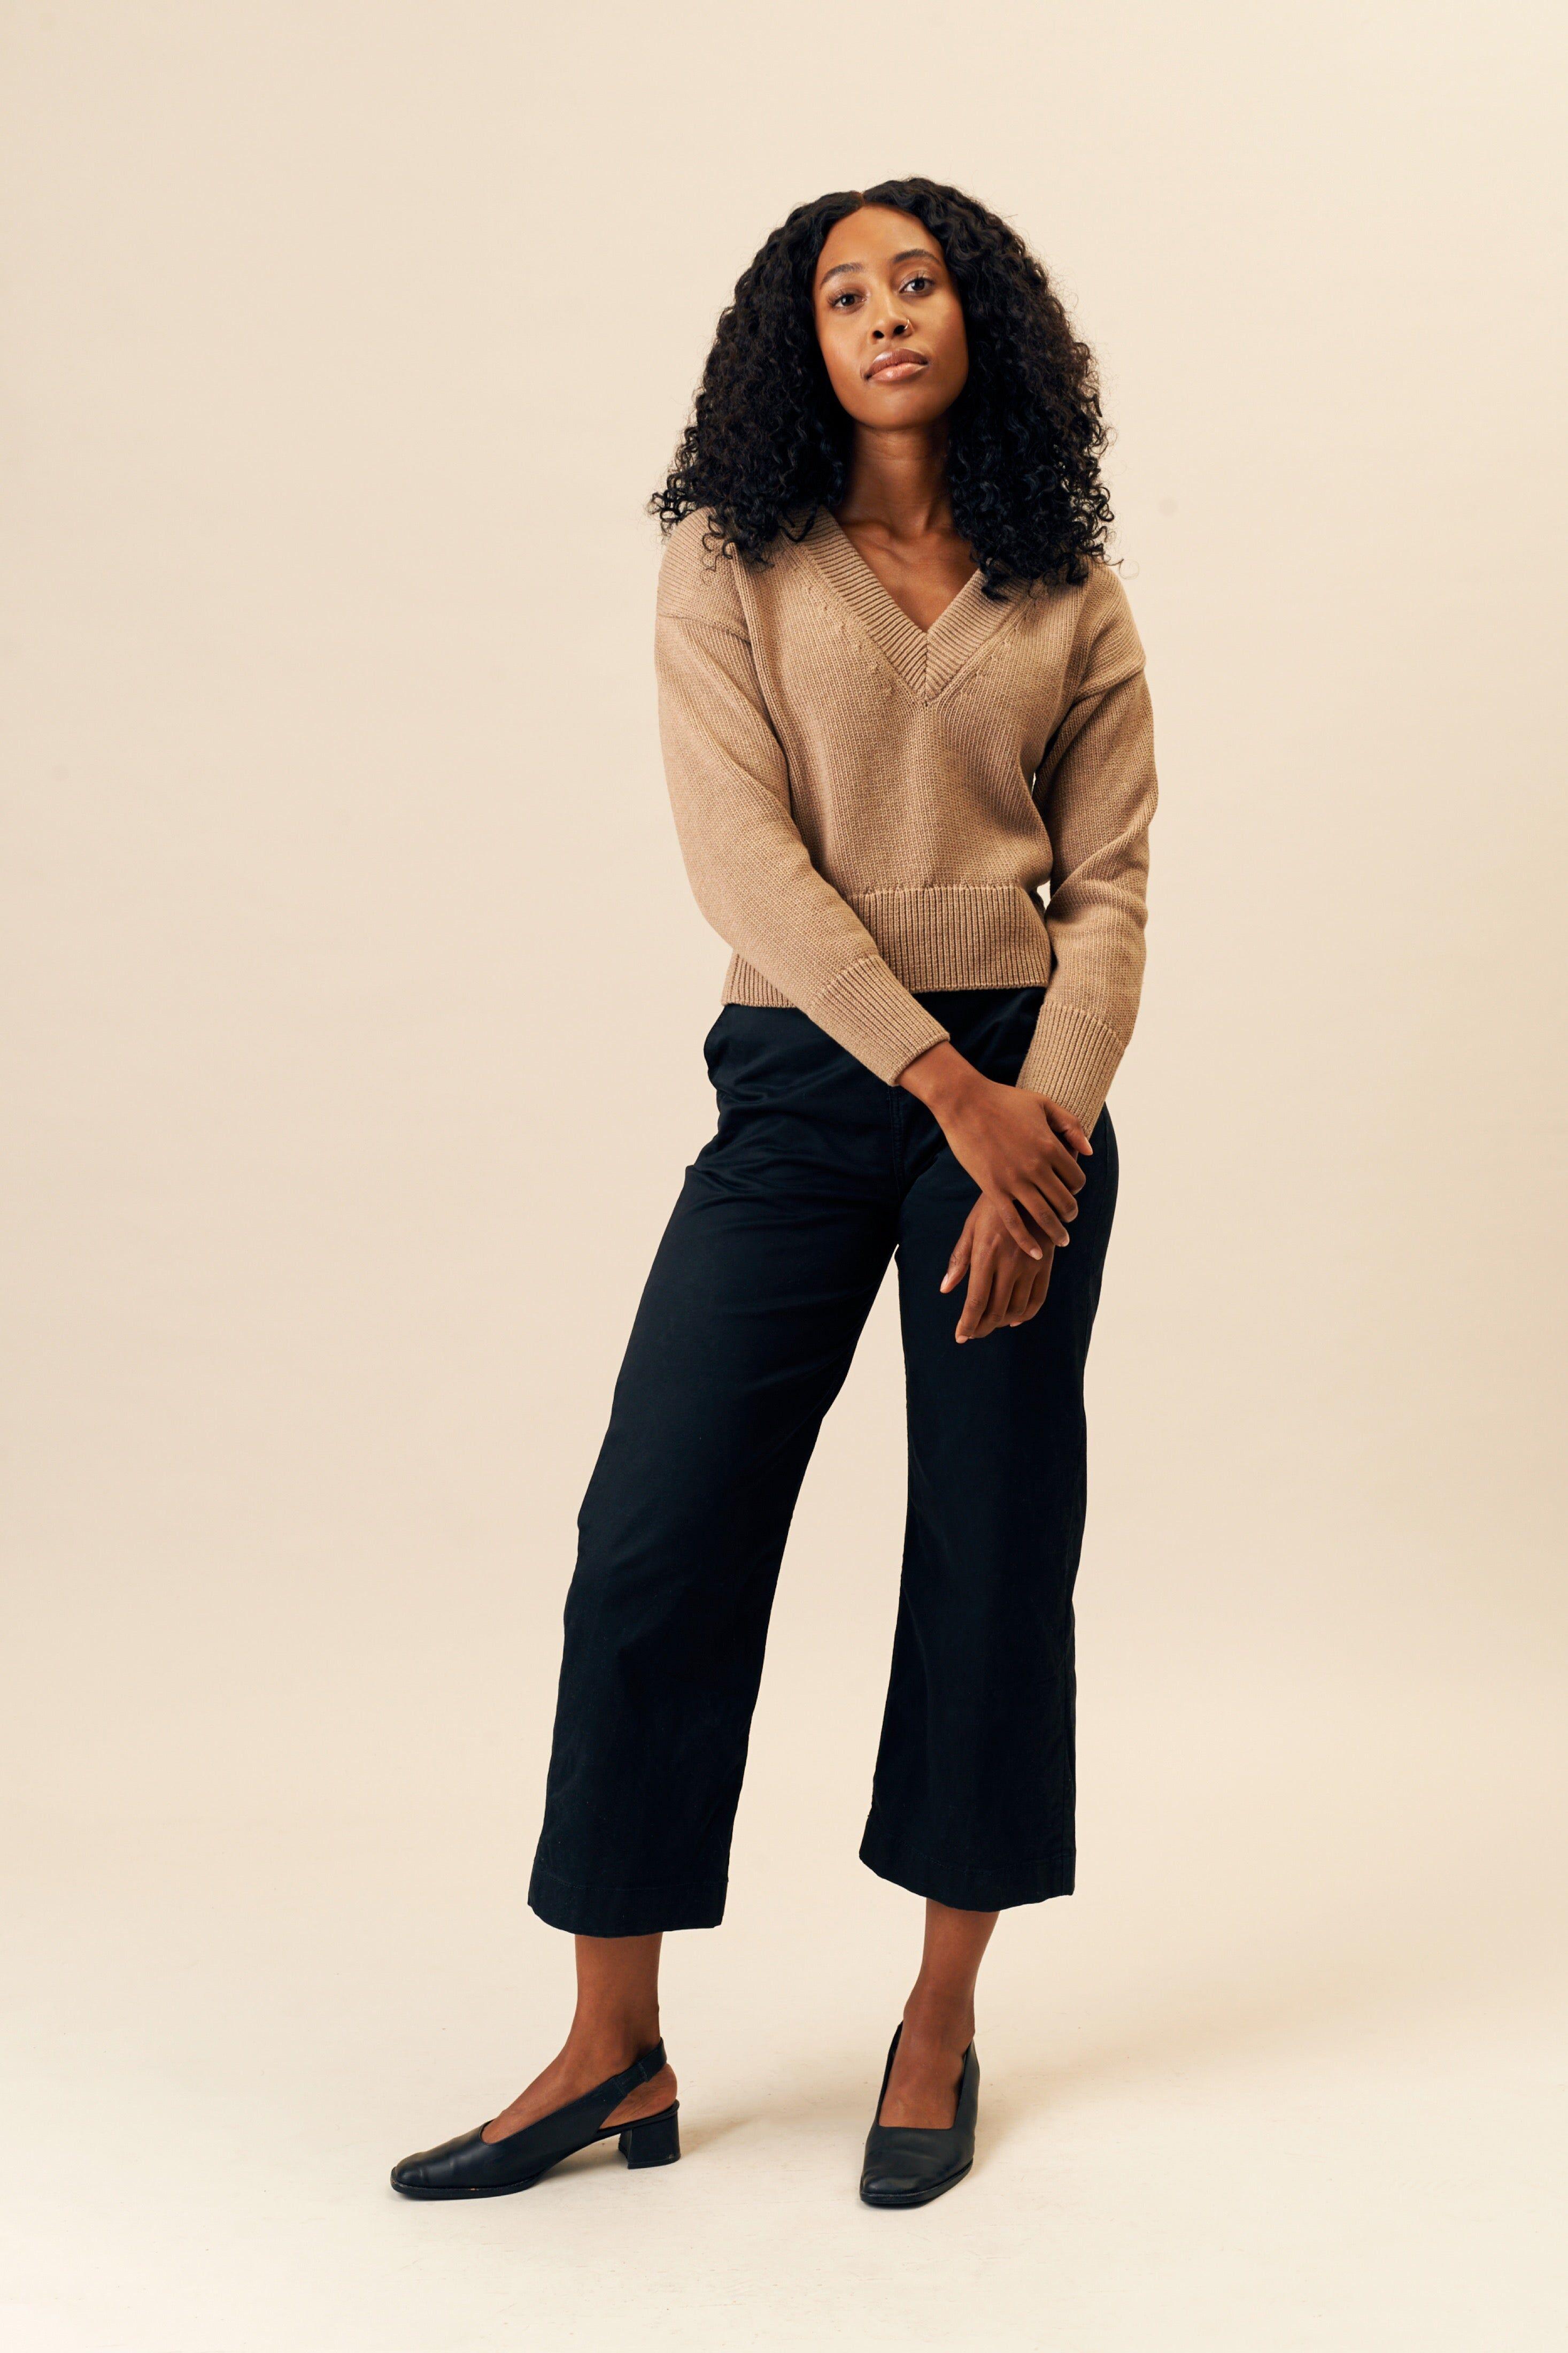 Kotn Women's Deep V-Neck Sweater in Caramel Brown, Size XL